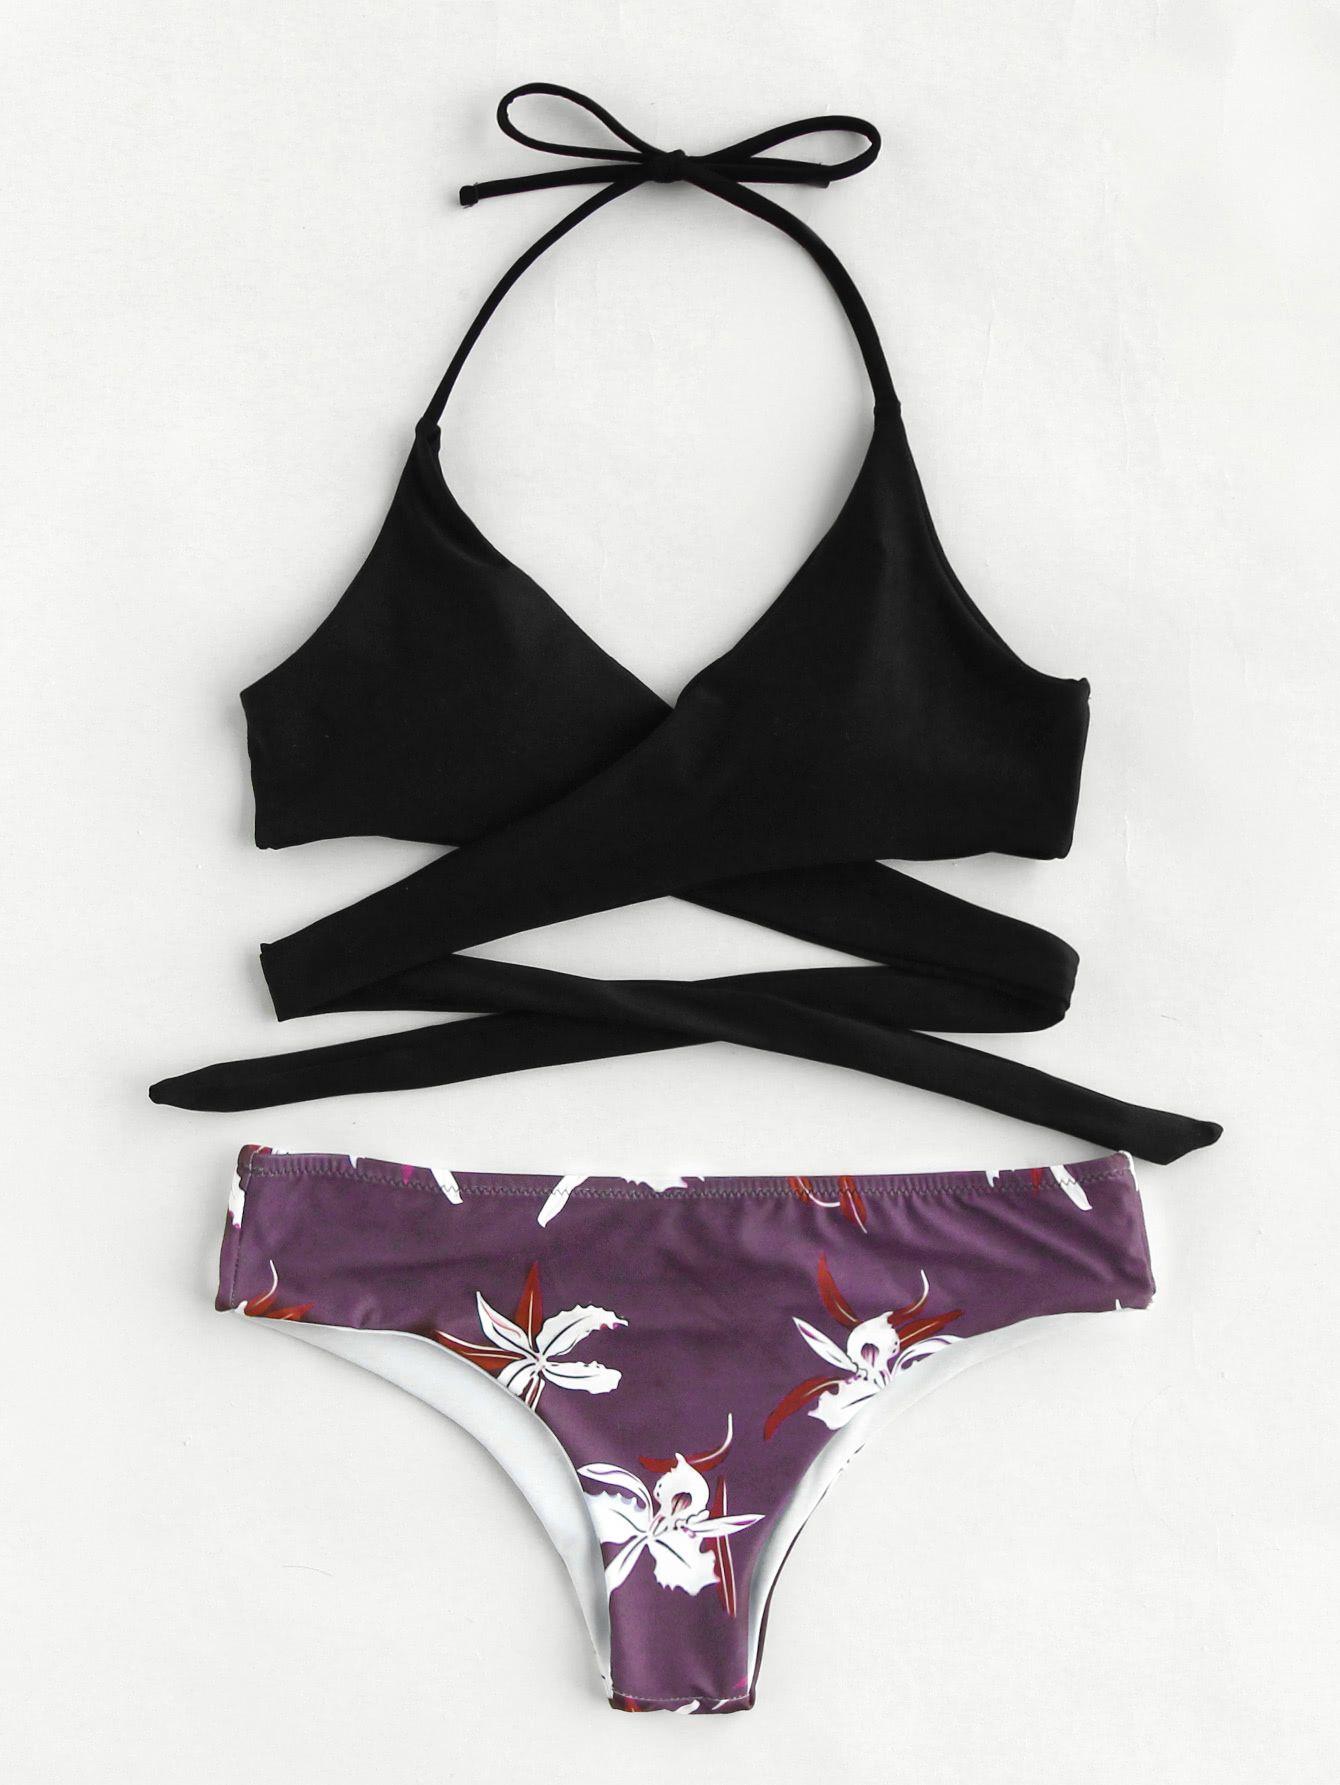 da8945cf9e Shop Flower Print Self Tie Wrap Bikini Set online. SheIn offers Flower  Print Self Tie Wrap Bikini Set & more to fit your fashionable needs.